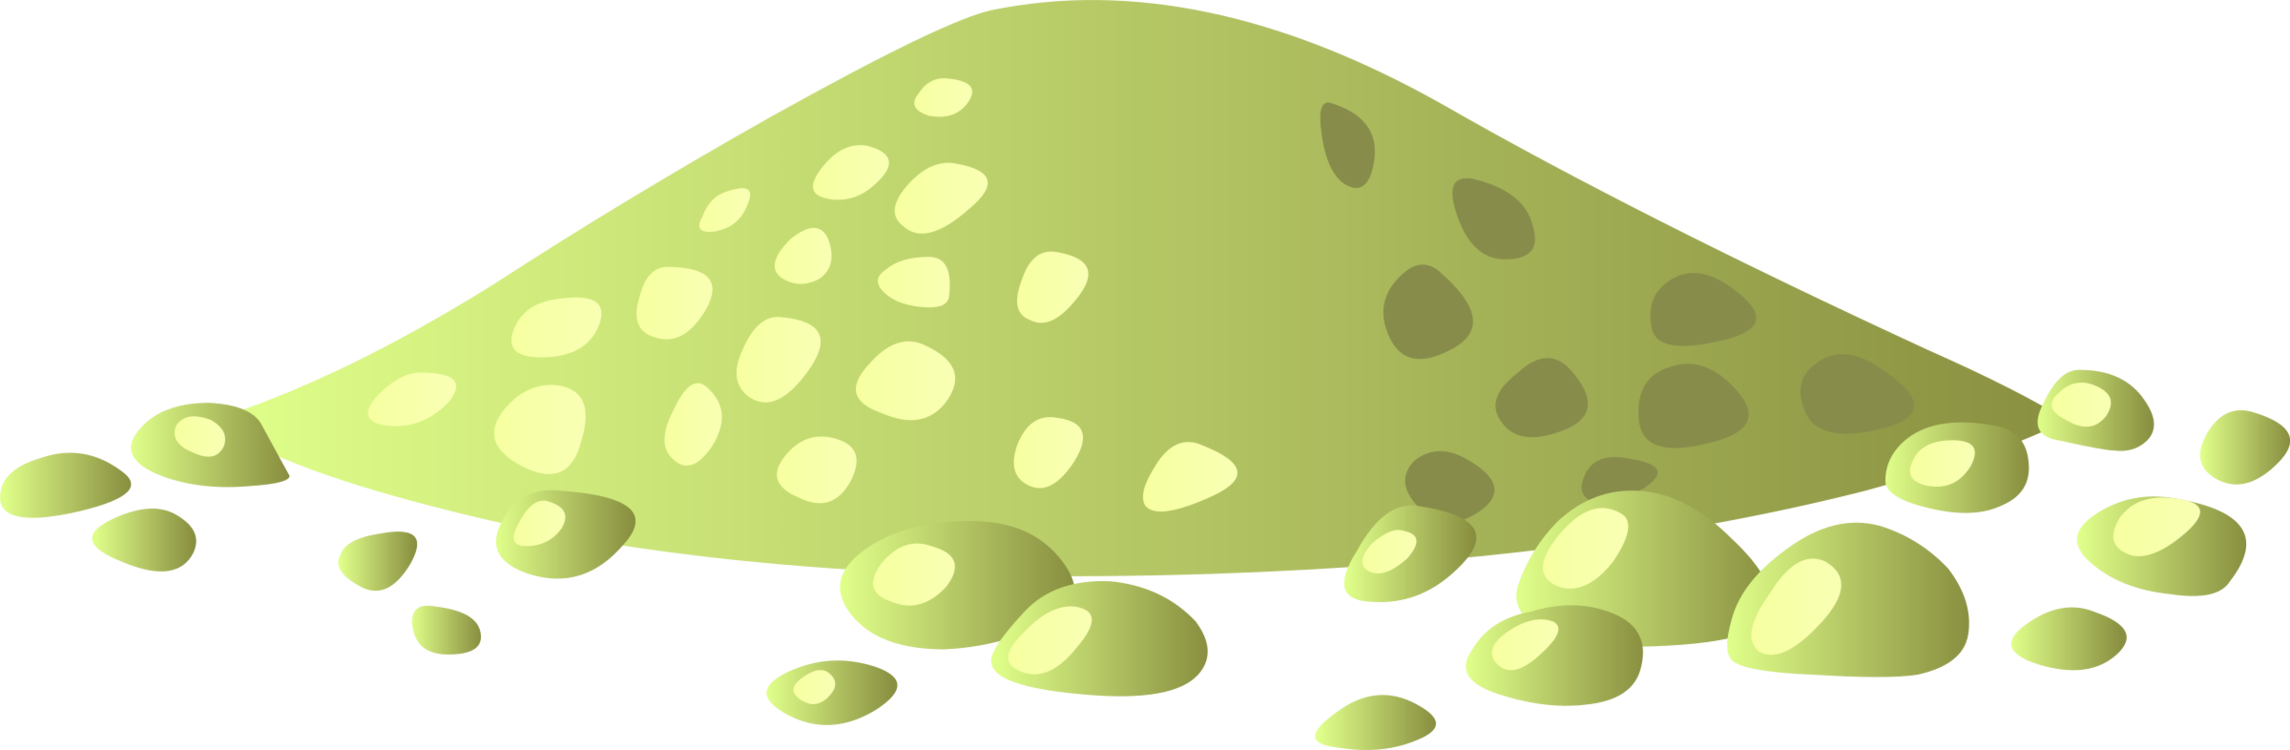 Green,Frog,Amphibian